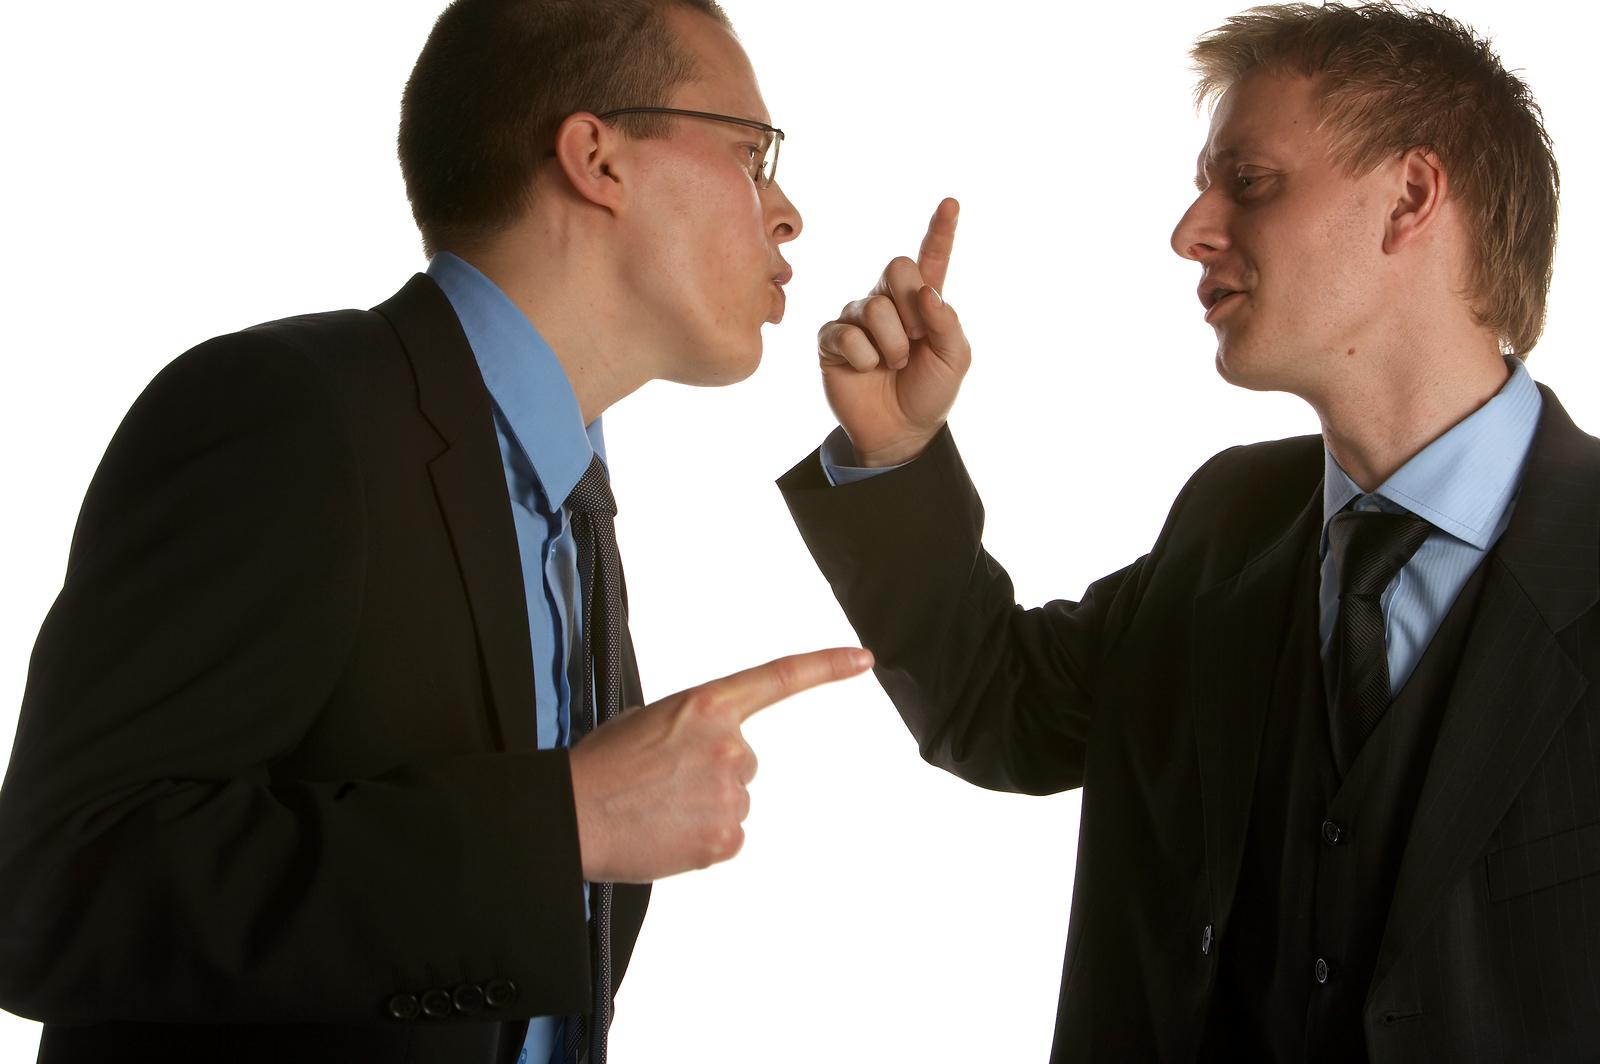 Как на отвечать на хамство на работе со стороны сотрудника